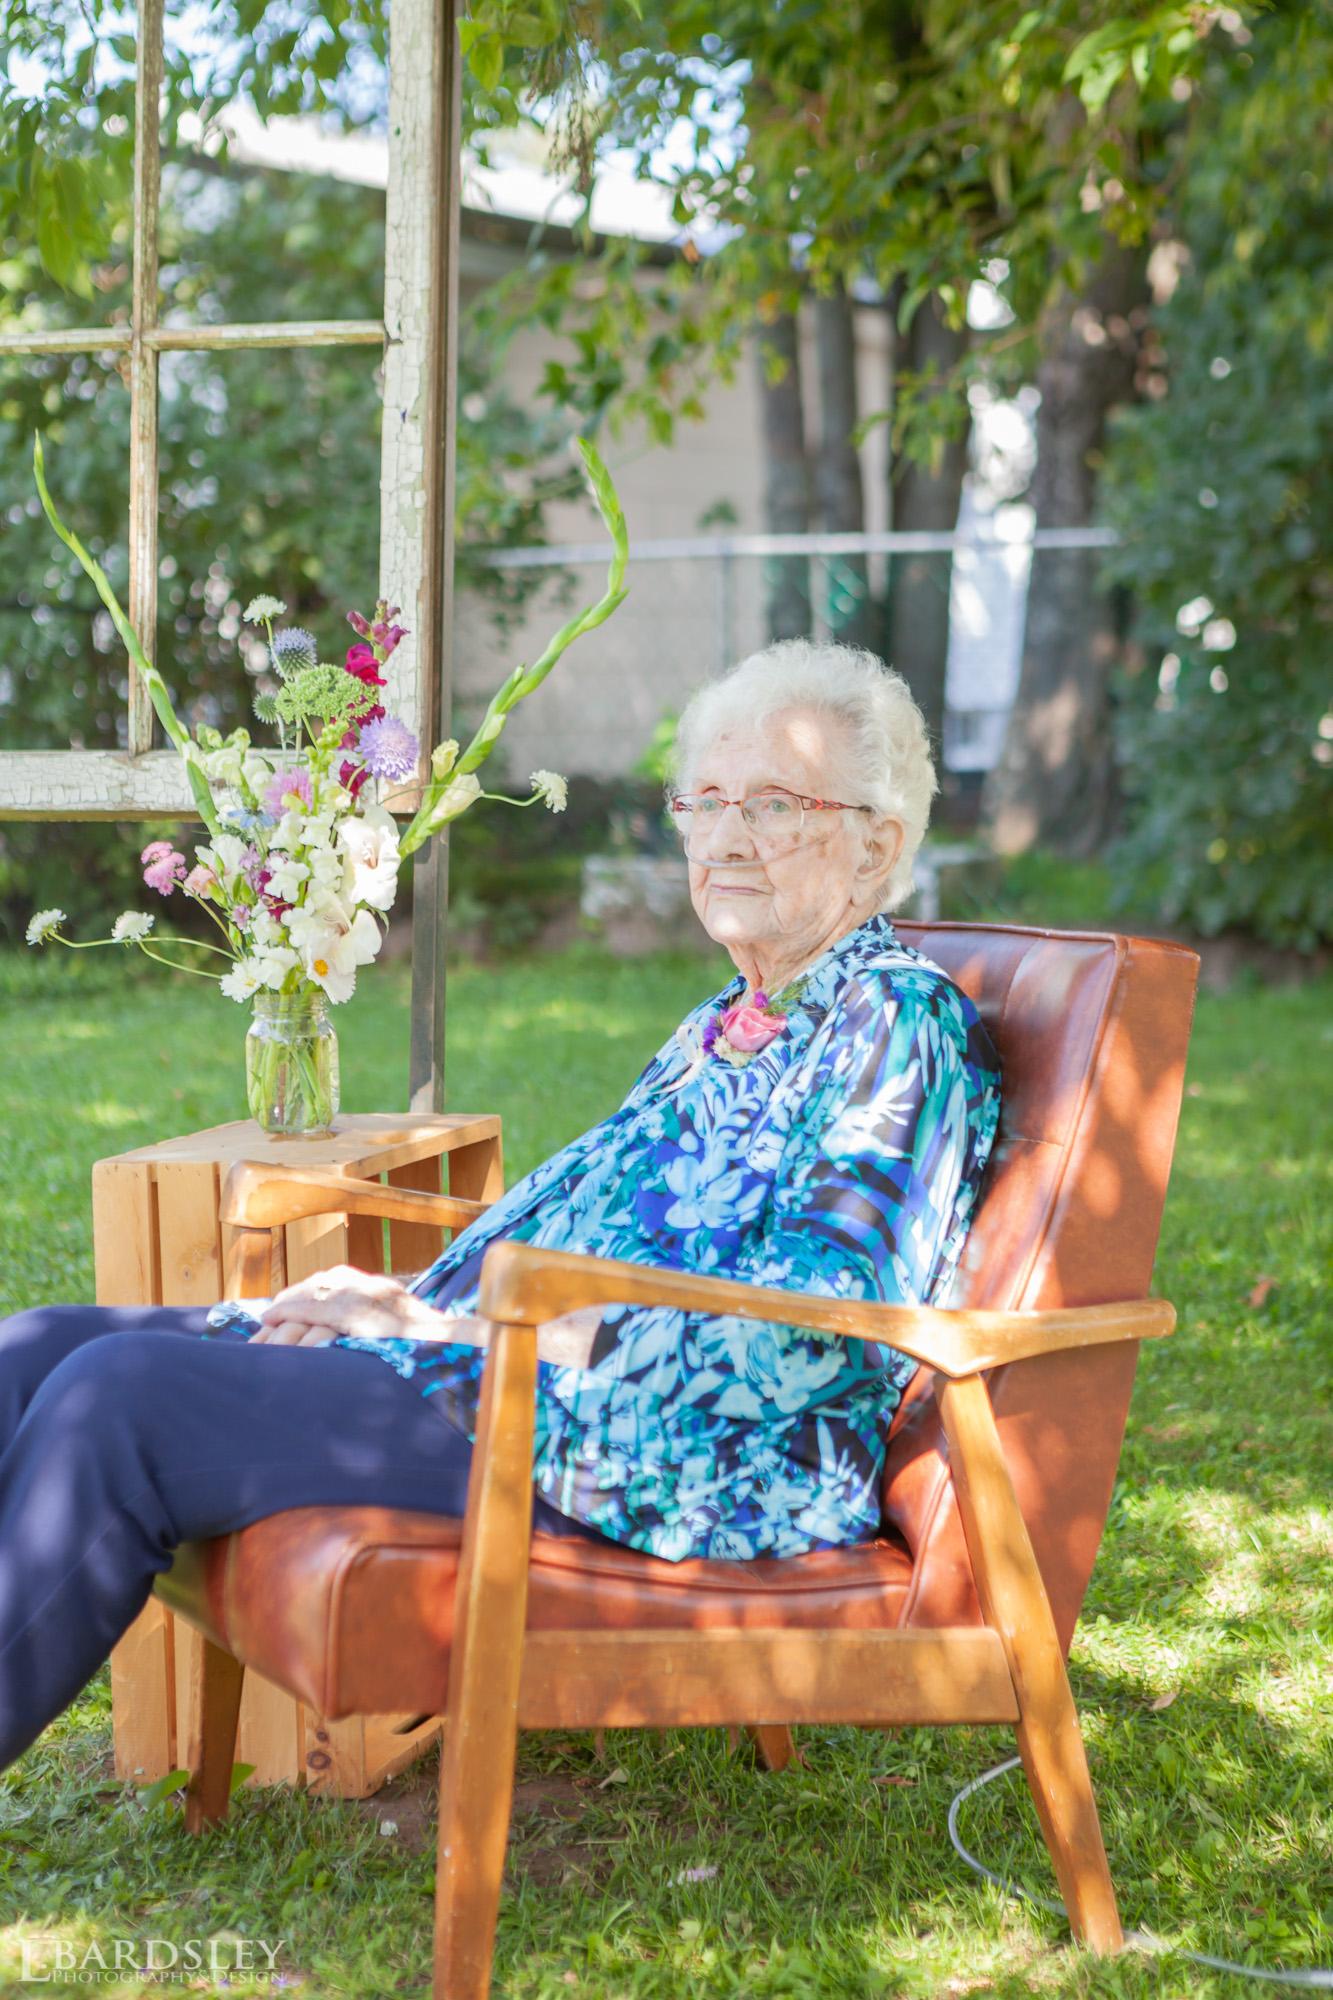 For my 95th birthday